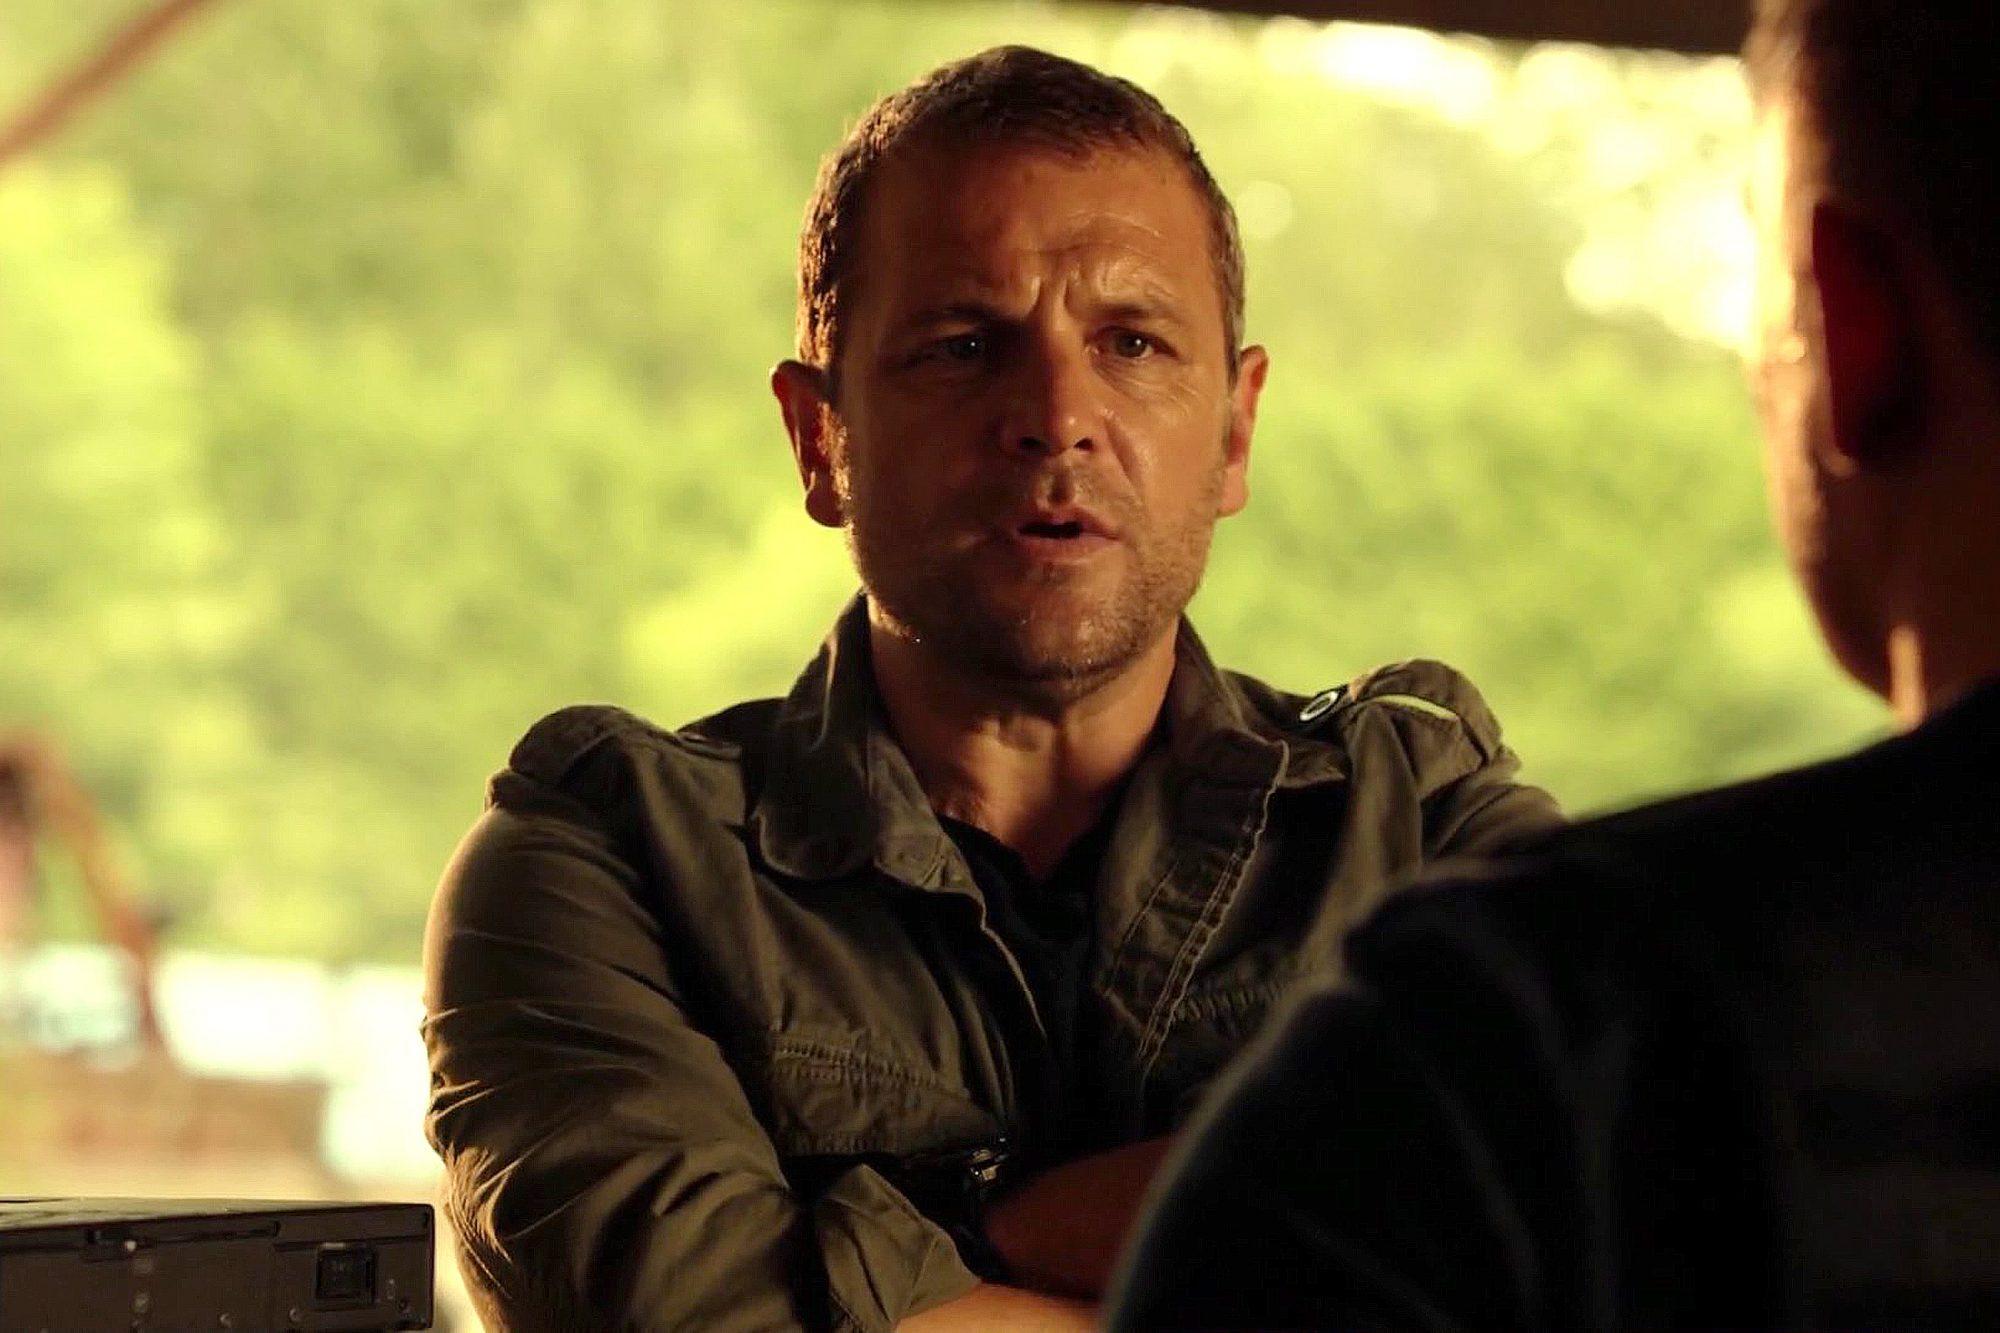 David Cubitt as Mark Shaw